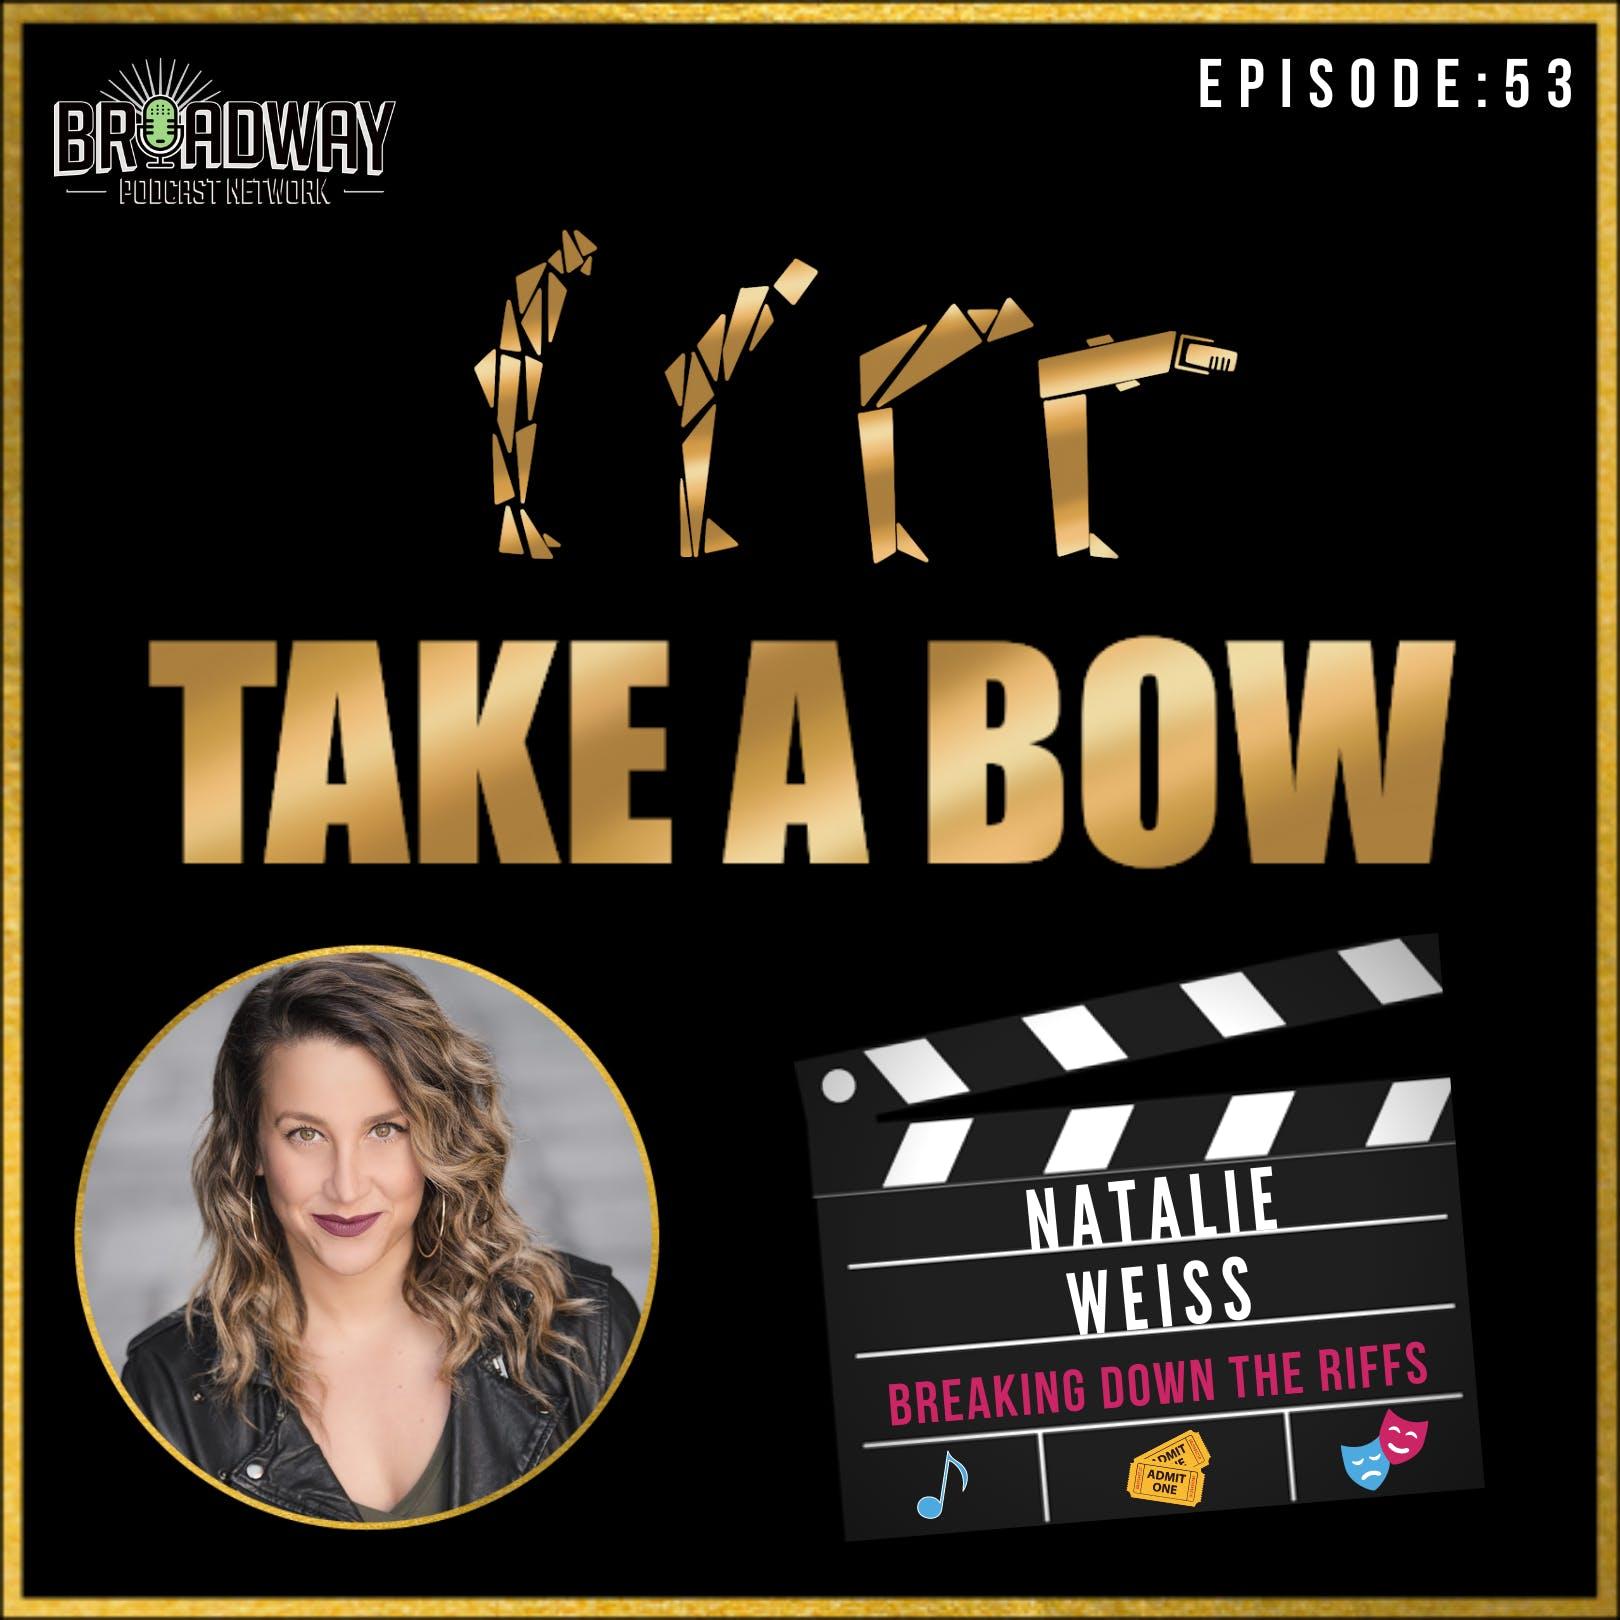 #53 - Natalie Weiss is Breaking Down The Riffs